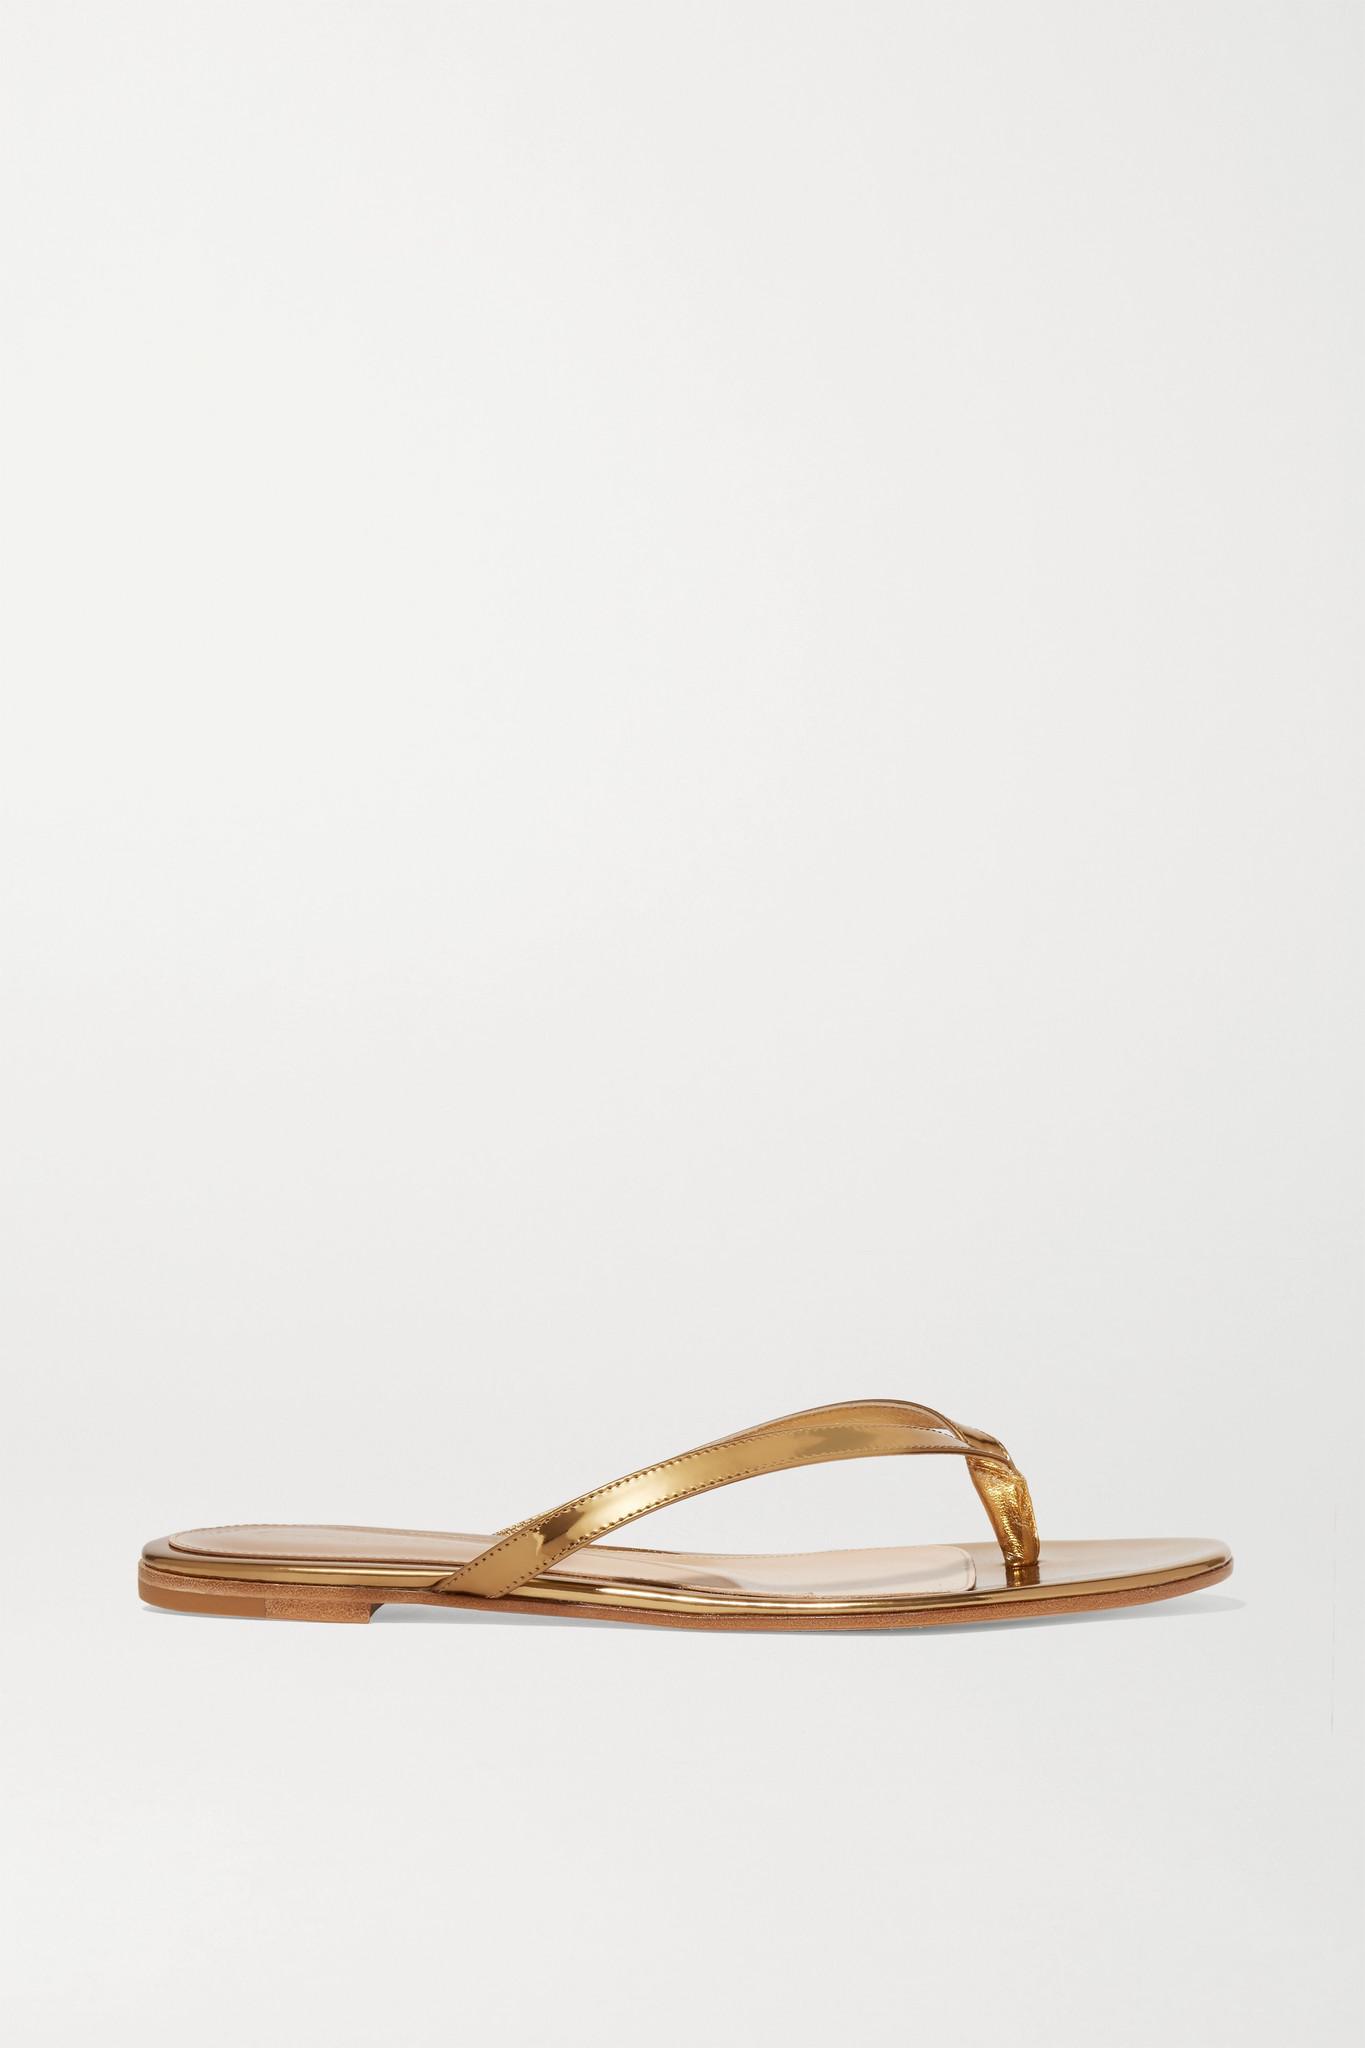 GIANVITO ROSSI - 镜面皮革凉鞋 - 金色 - IT37.5